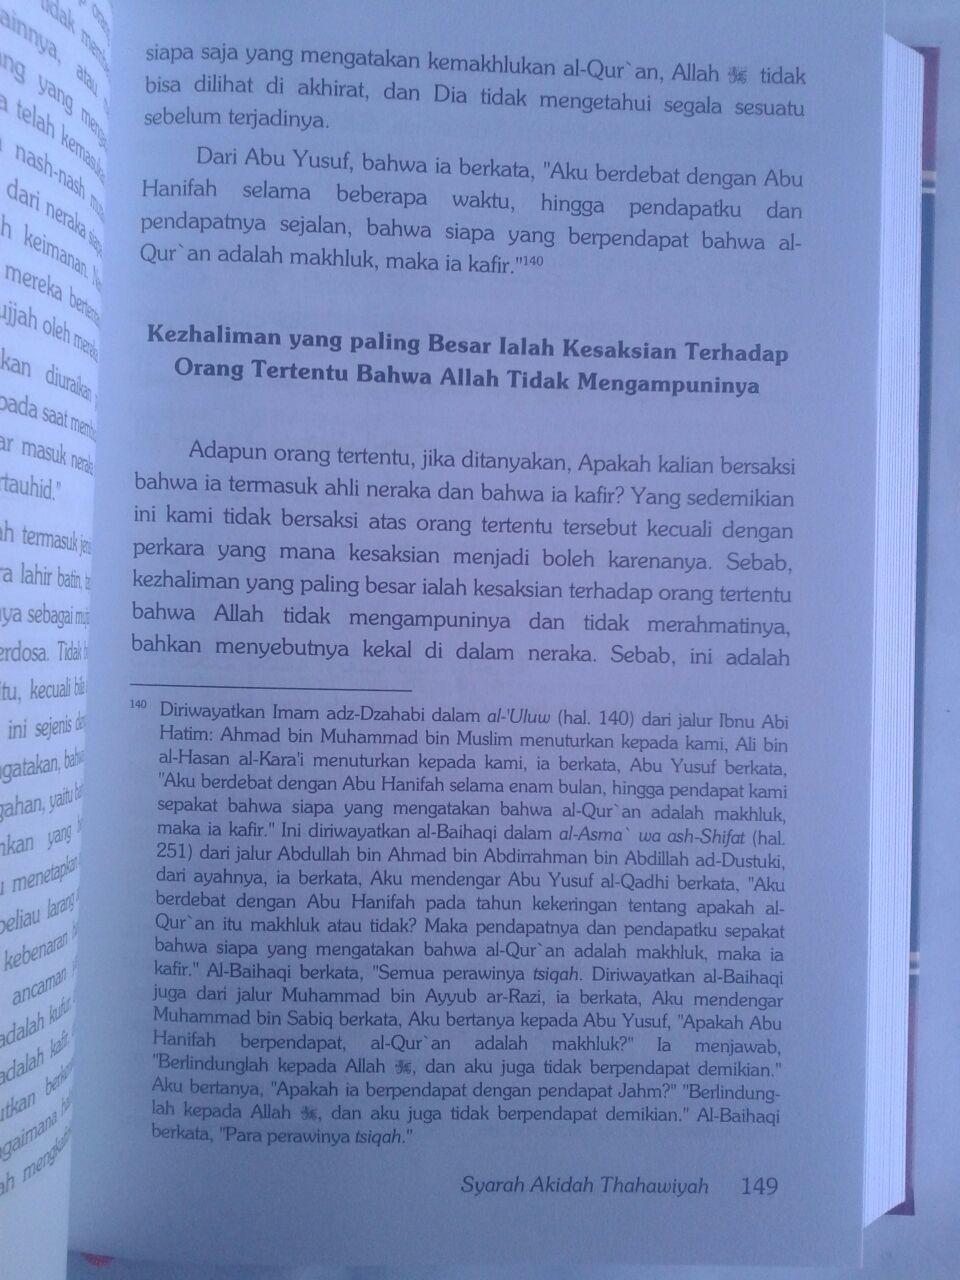 Buku Syarah Akidah Thahawiyah Akidah Ahlussunnah isi 3